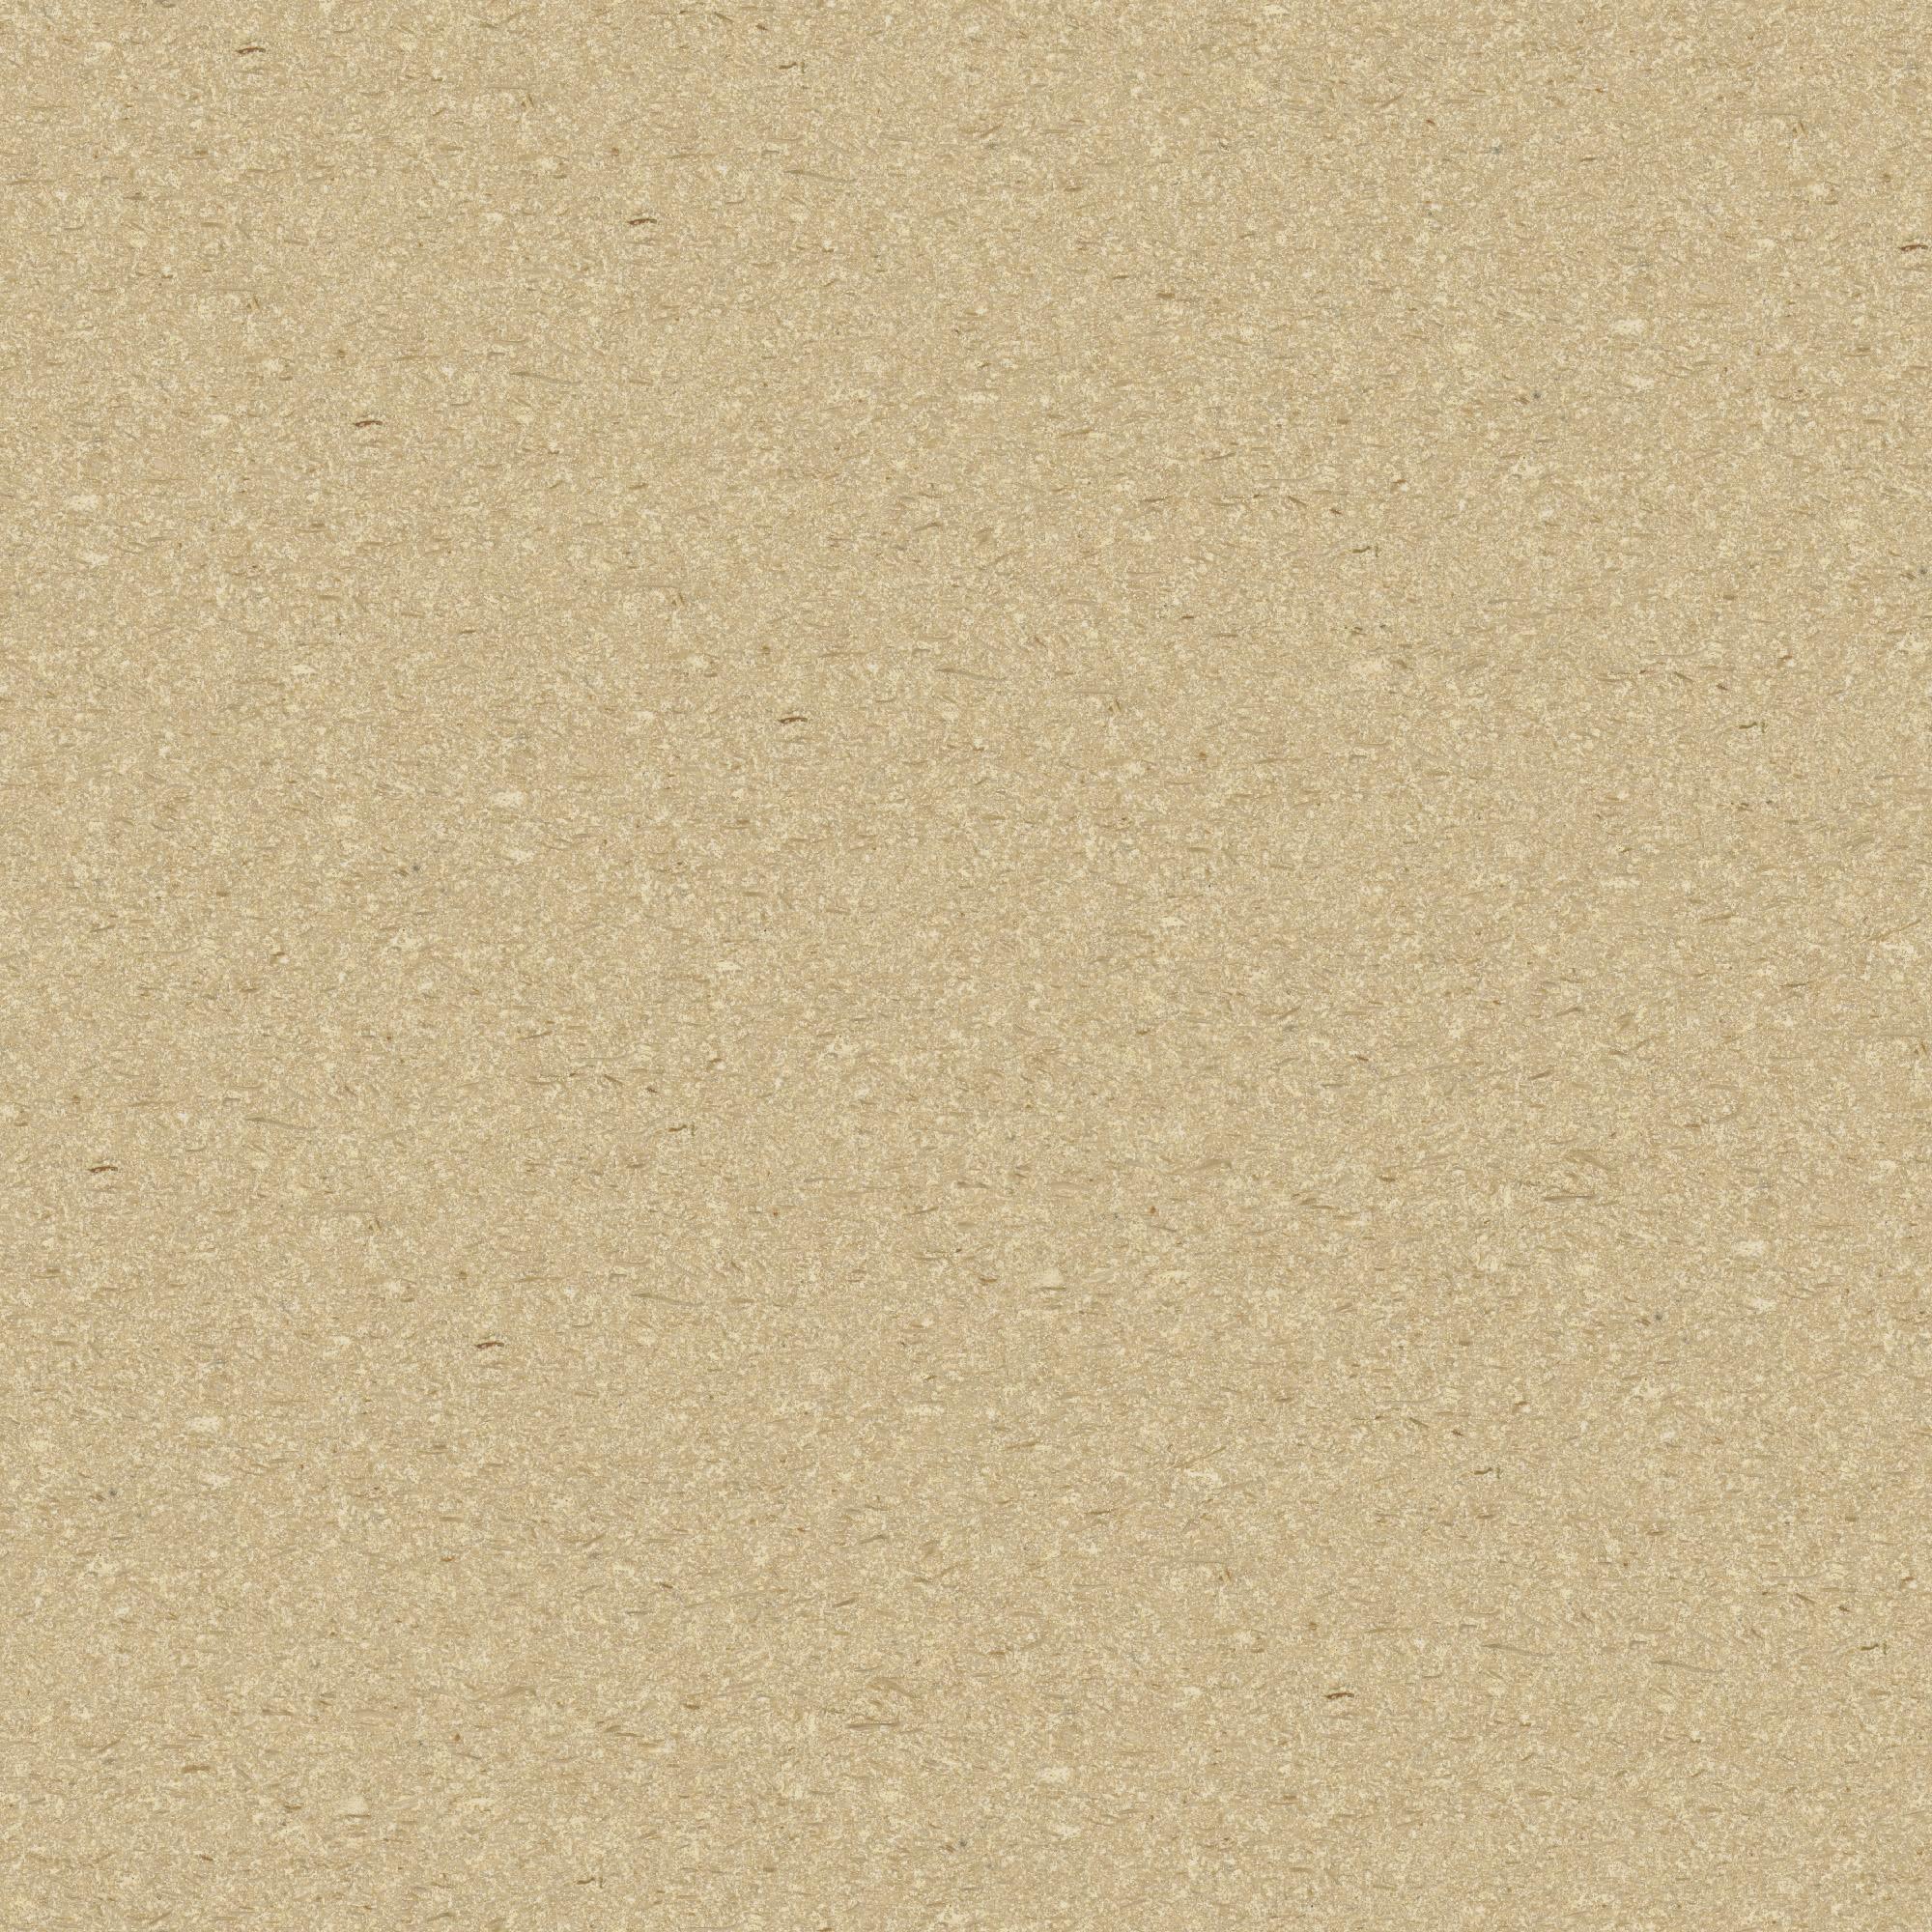 perla beige.jpg